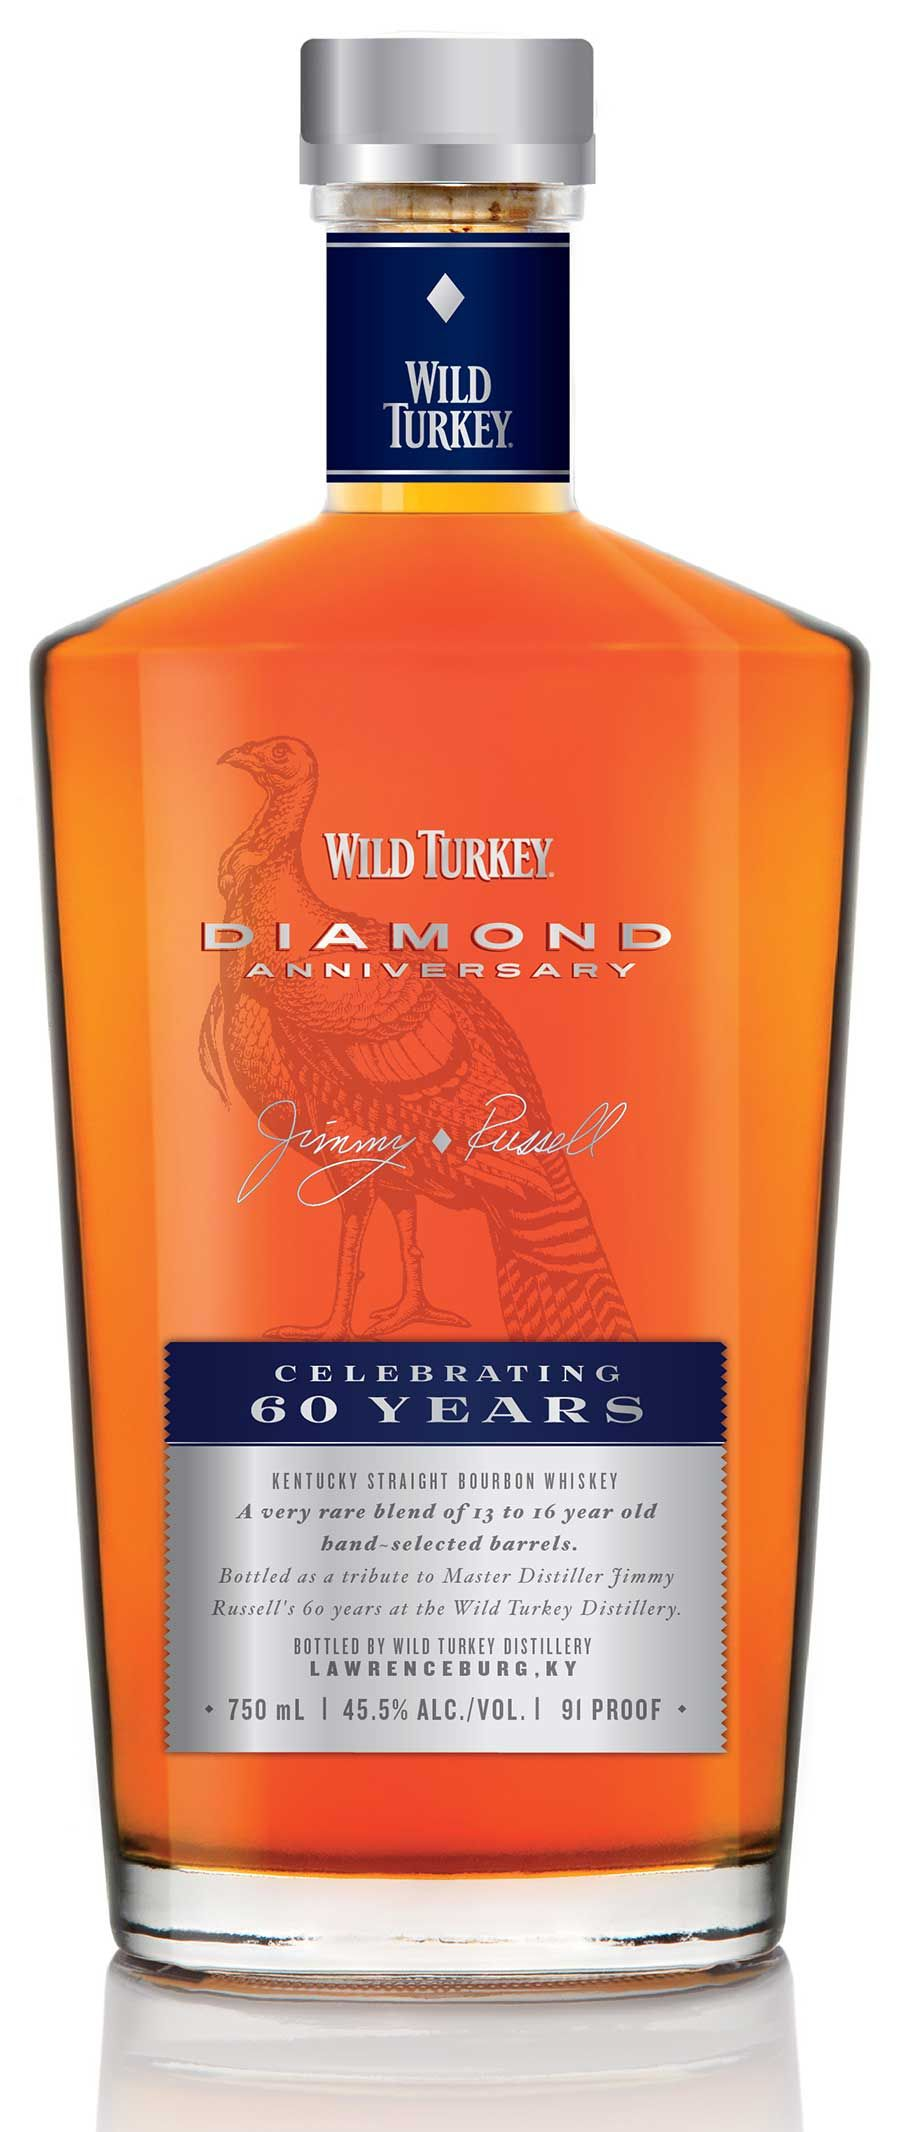 Wild Turkey Diamond Anniversary Bourbon Review Bourbon Banter Kentucky Straight Bourbon Whiskey Whiskey Bourbon Whiskey